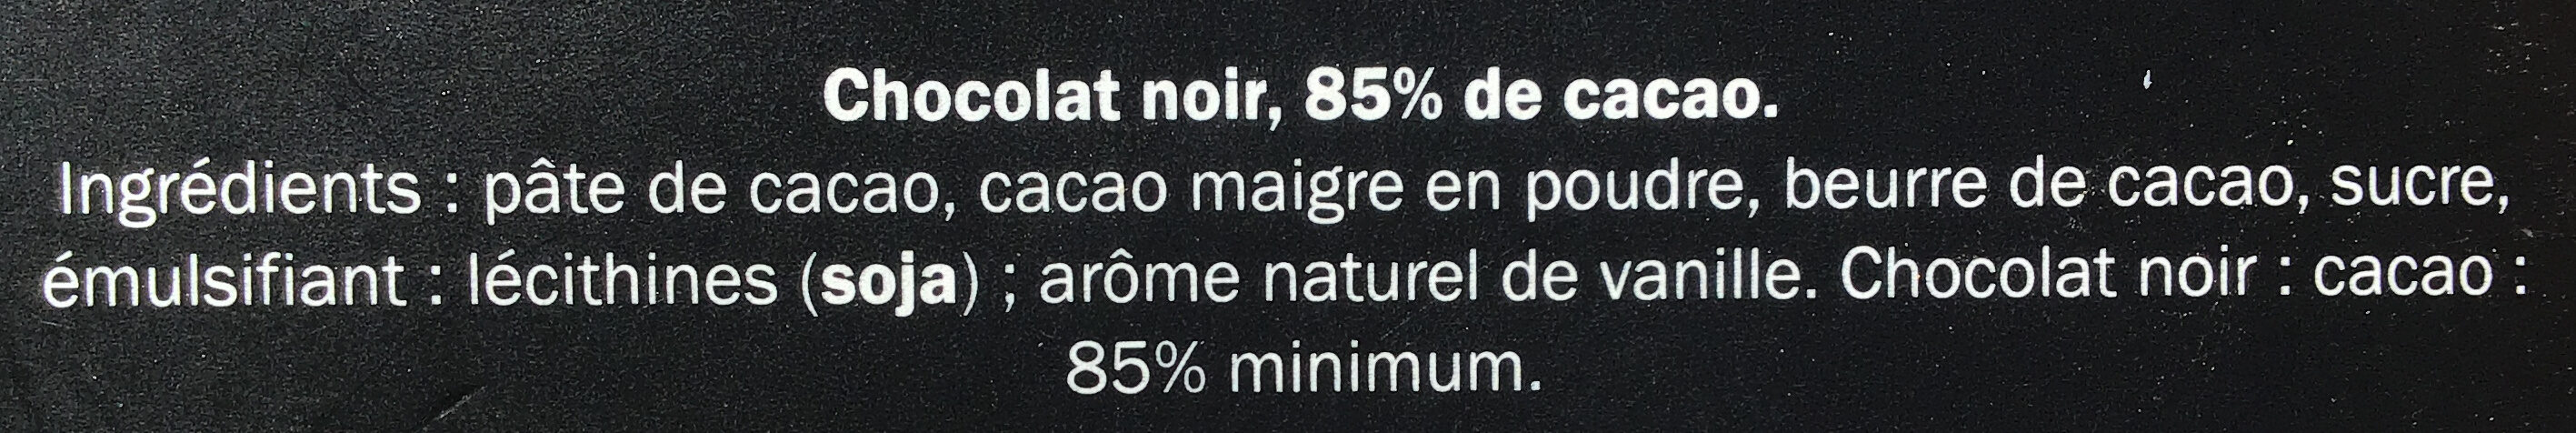 Supérieur 85% cacao - Ingredients